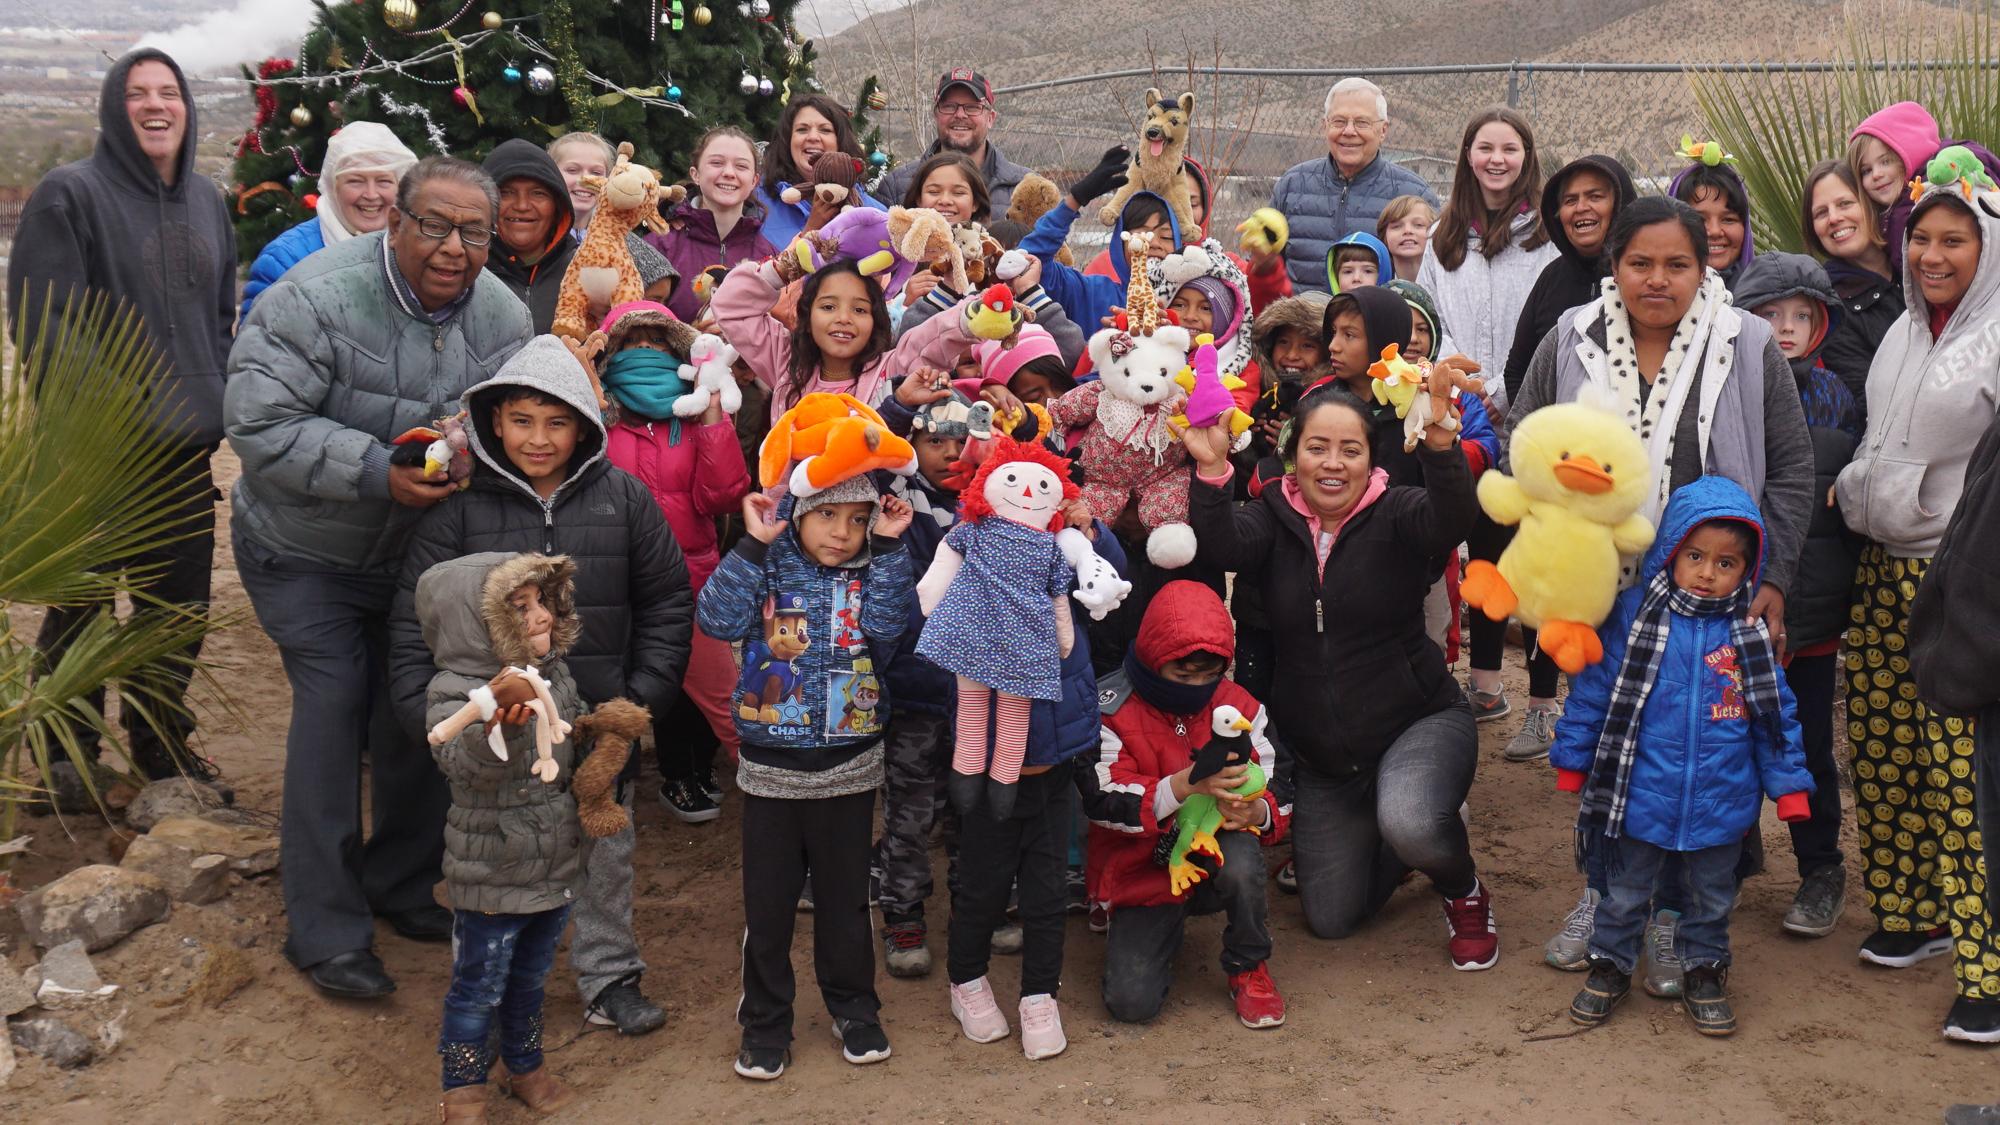 Minnesota Christmas Events 2019 Minnesota Family Christmas at YLM – Ysleta Lutheran Mission Human Care